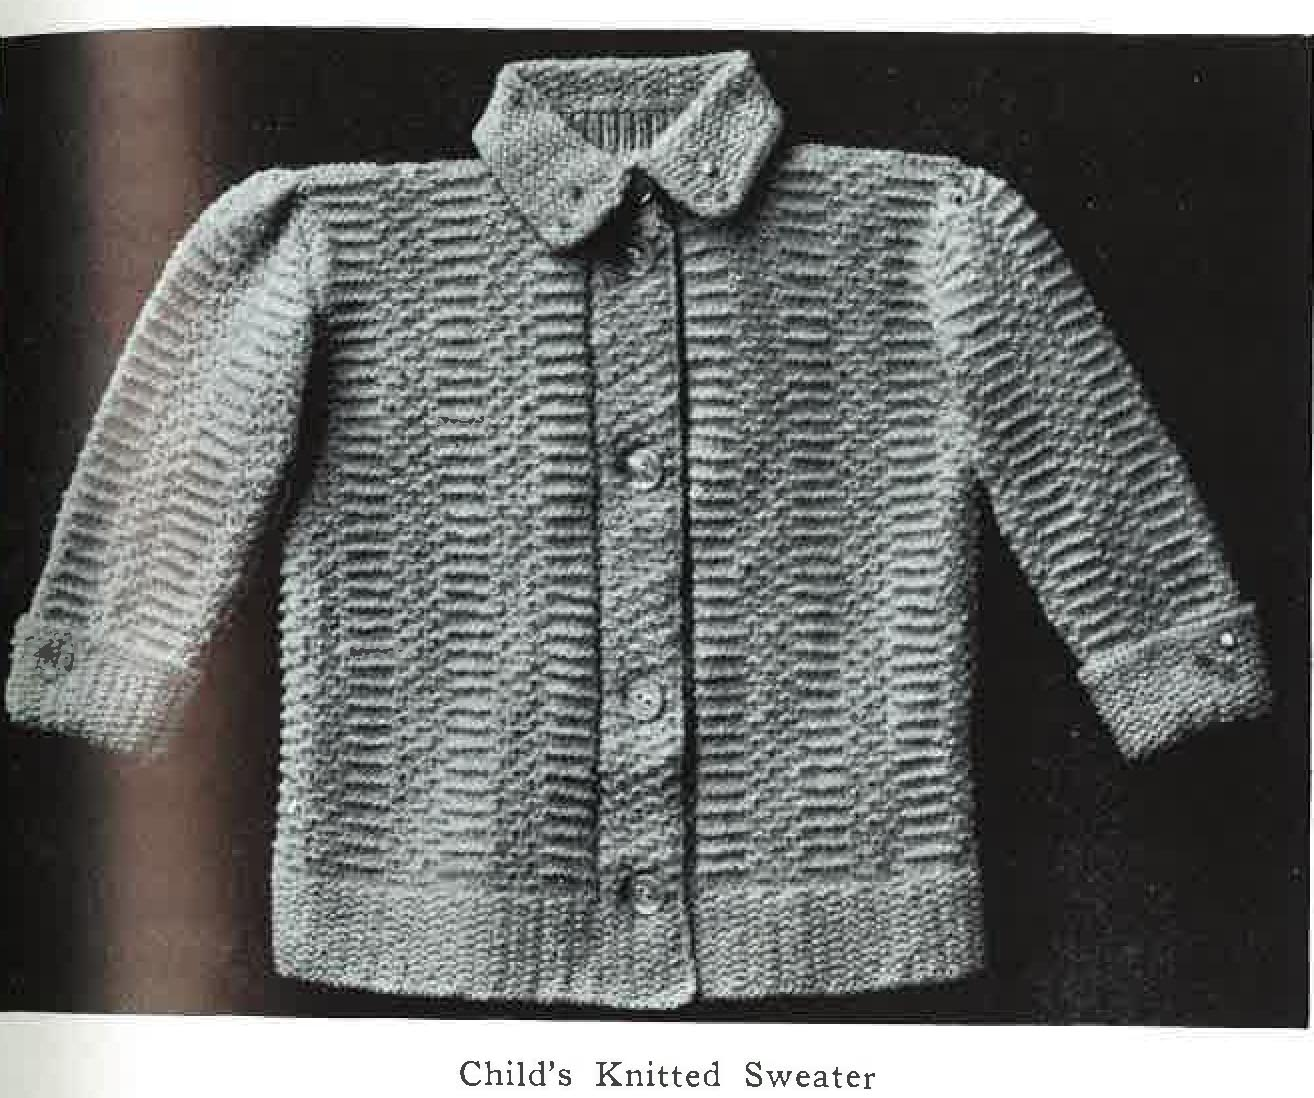 VintageSweater2